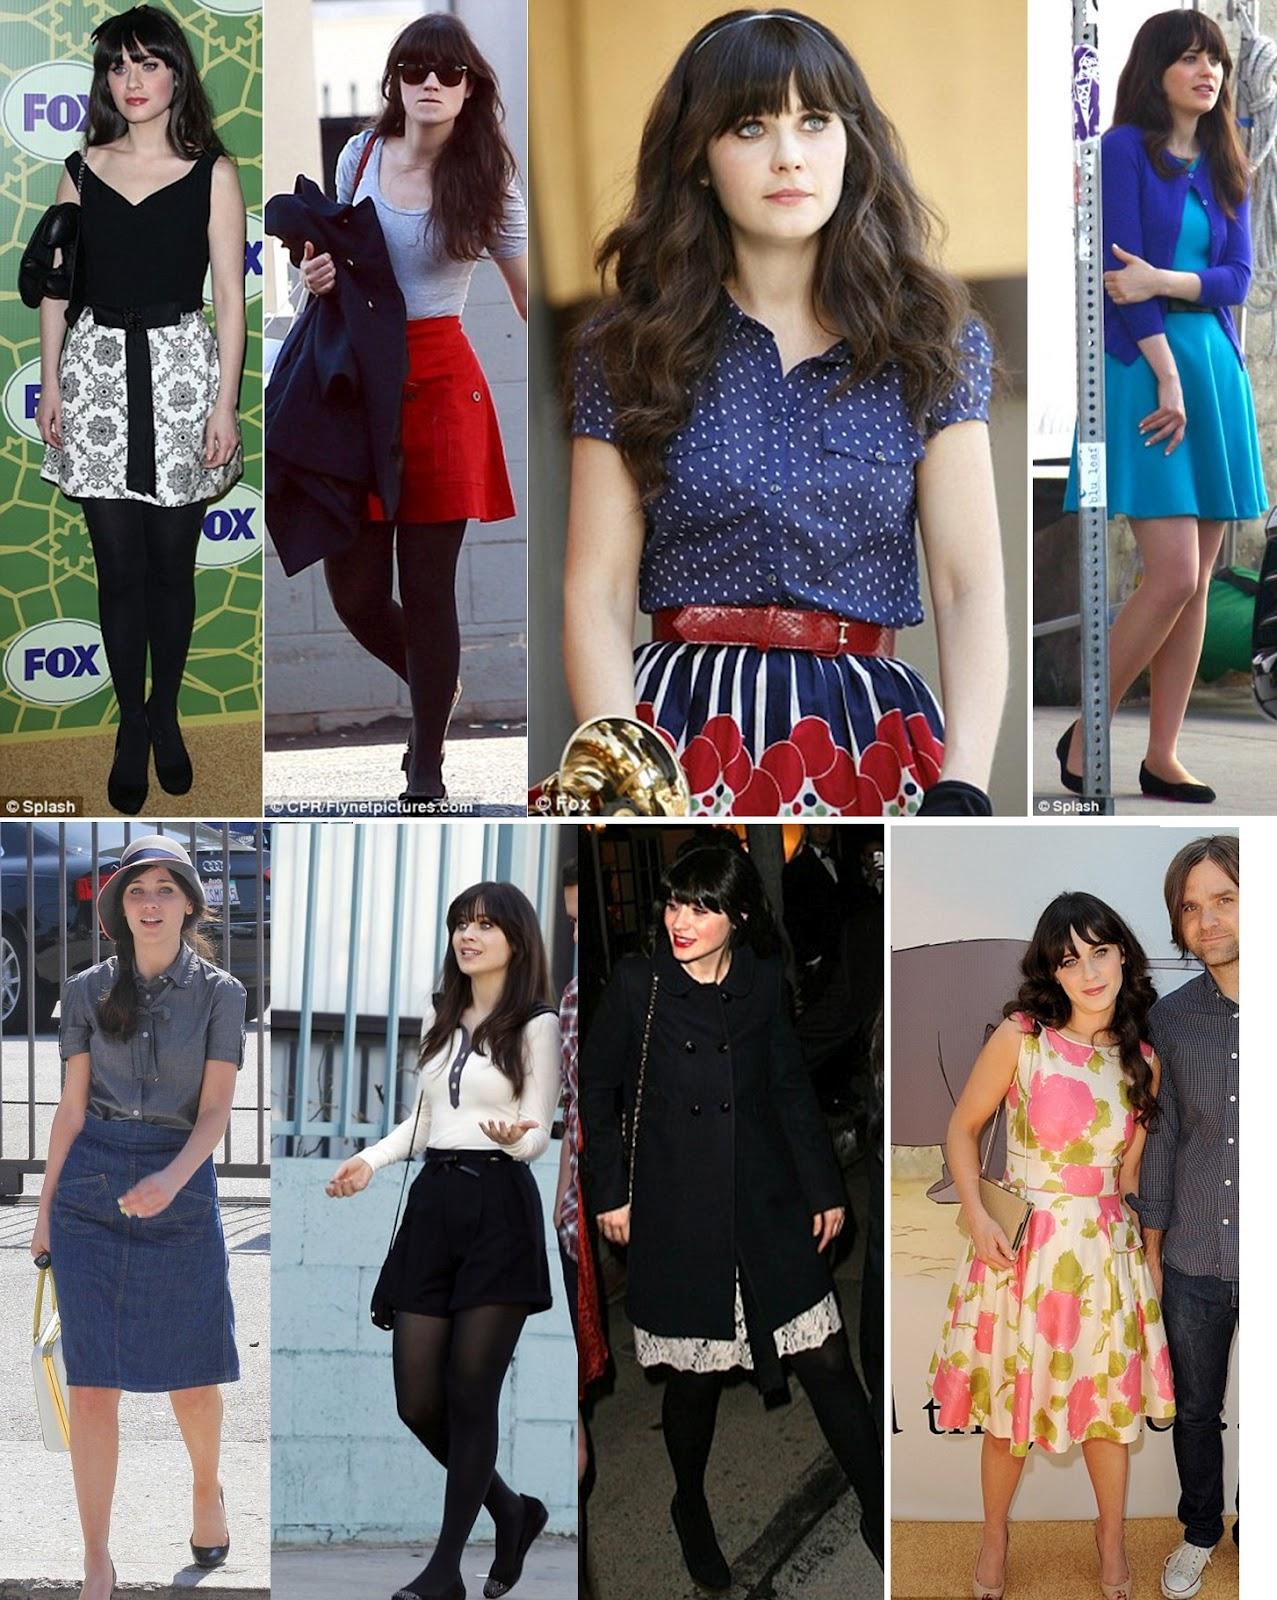 Zooey Deschanel Fashion The Perfect Hiding Pla...